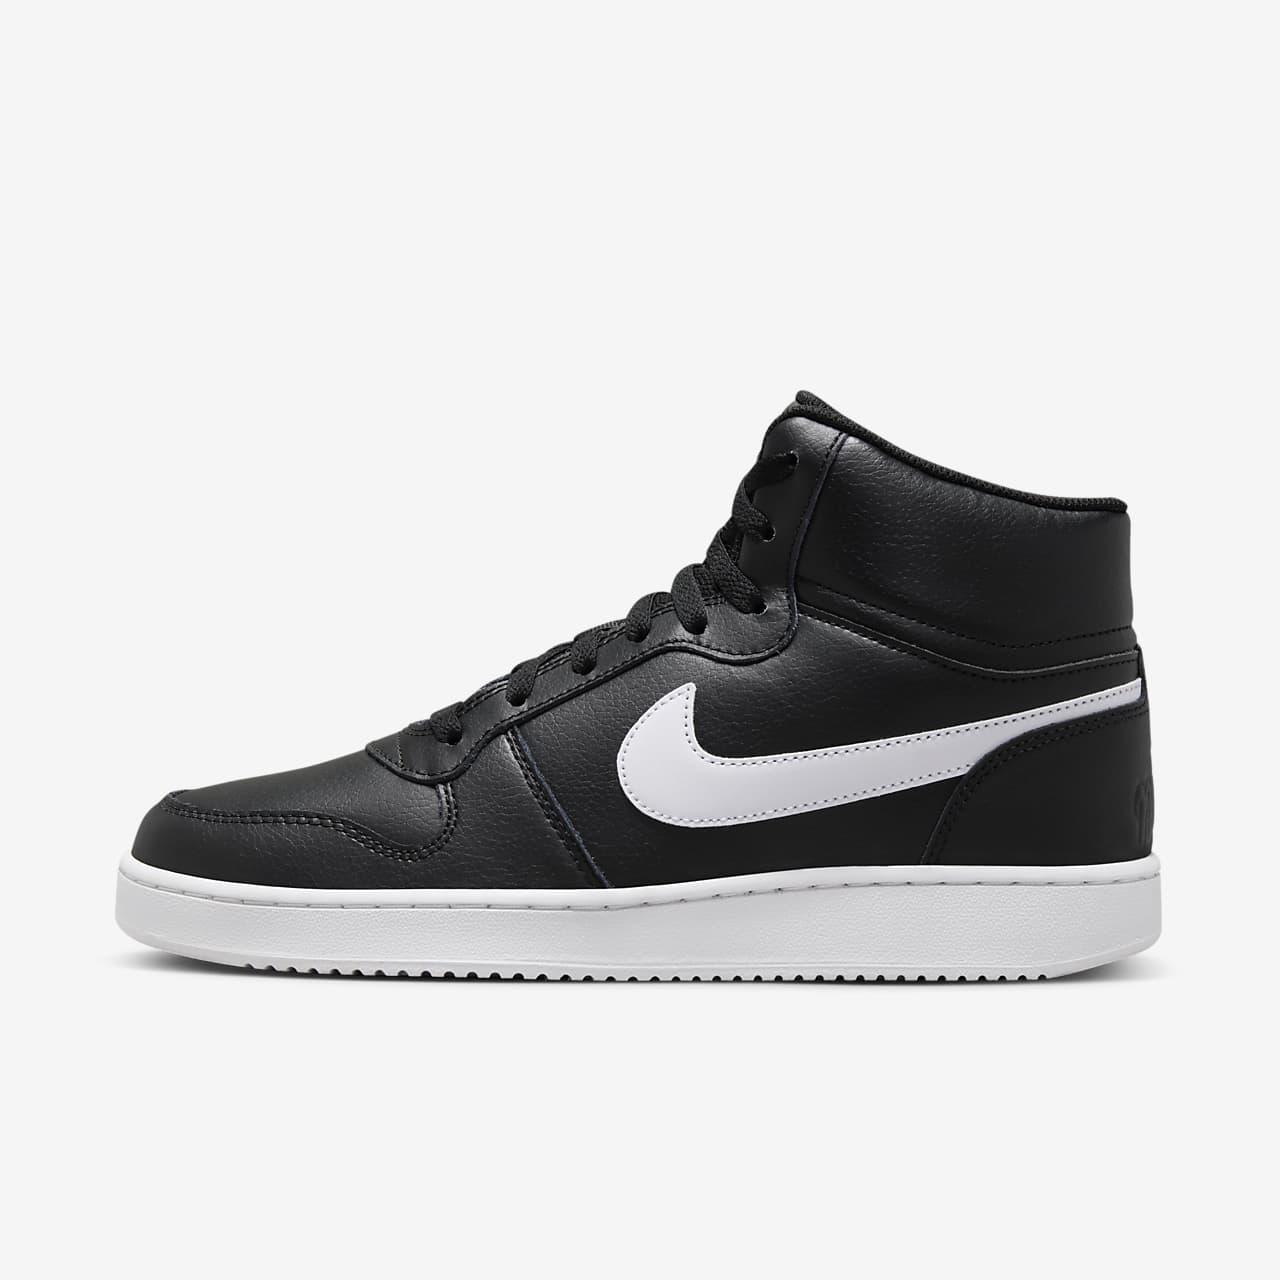 Nike Ebernon Mid Men's Shoes